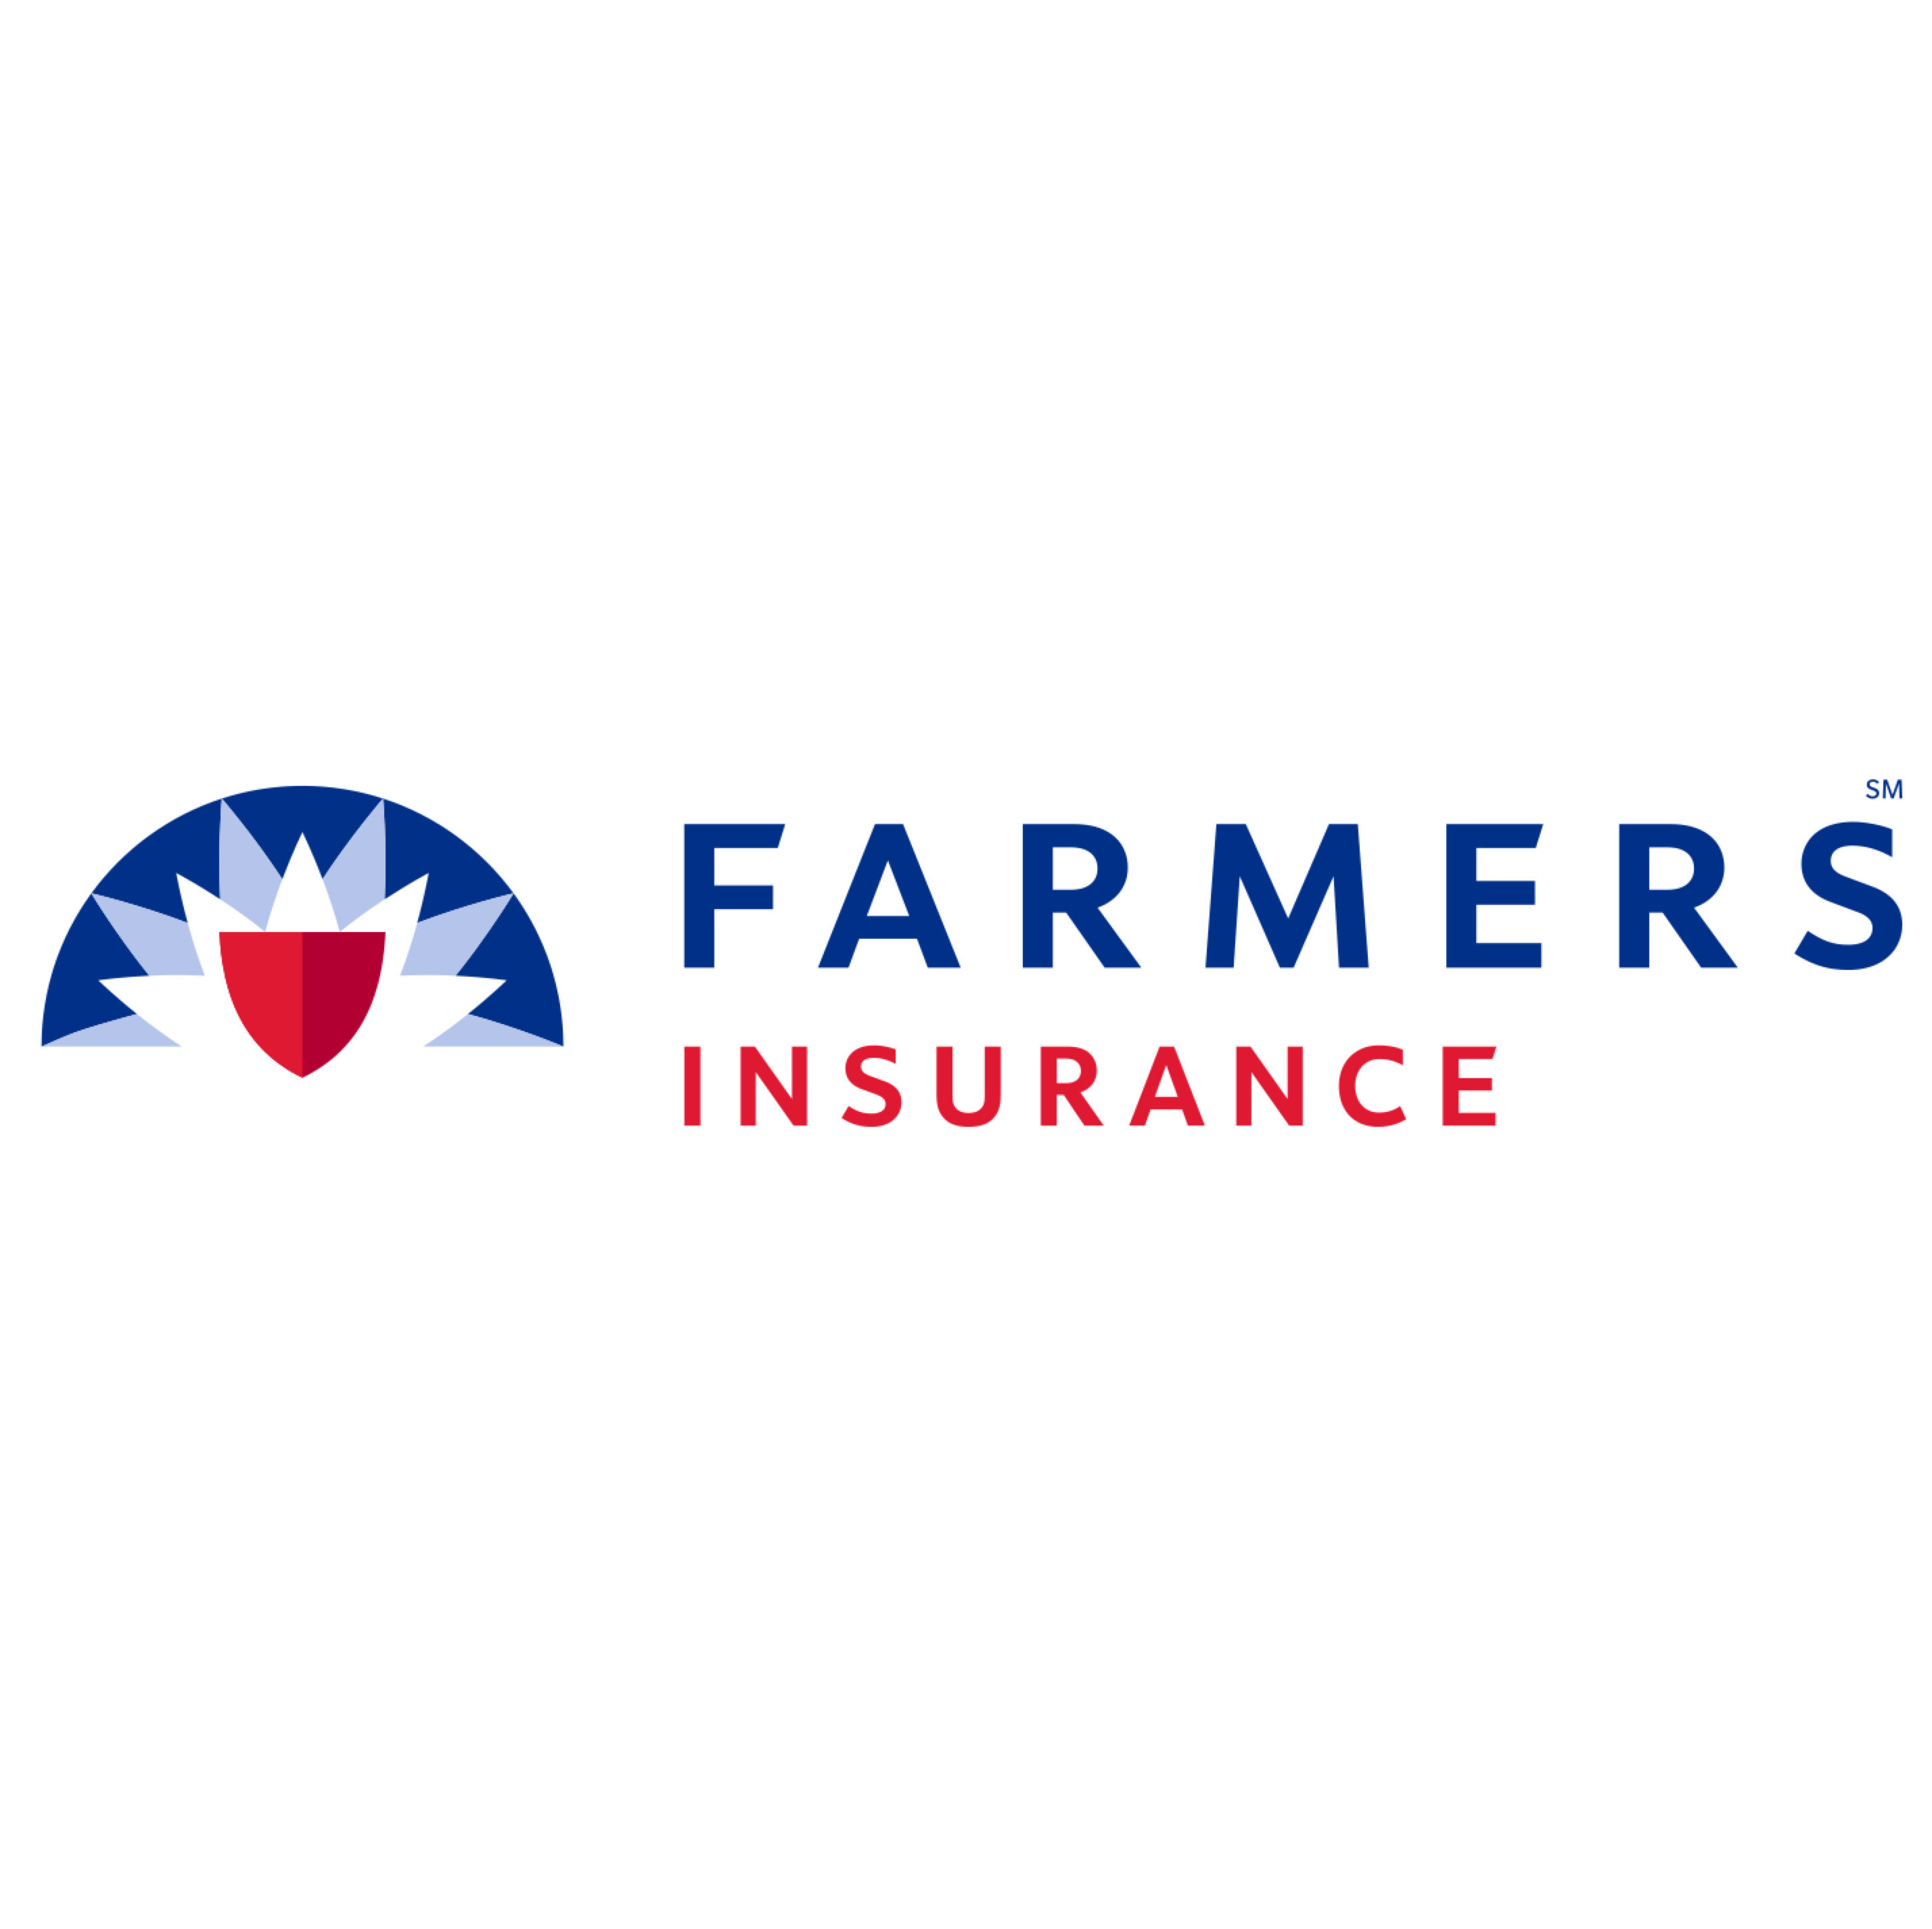 Farmers insurance 2018 summer internships ucla extension farmers insurance 2018 summer internships ucla extension career center xflitez Image collections